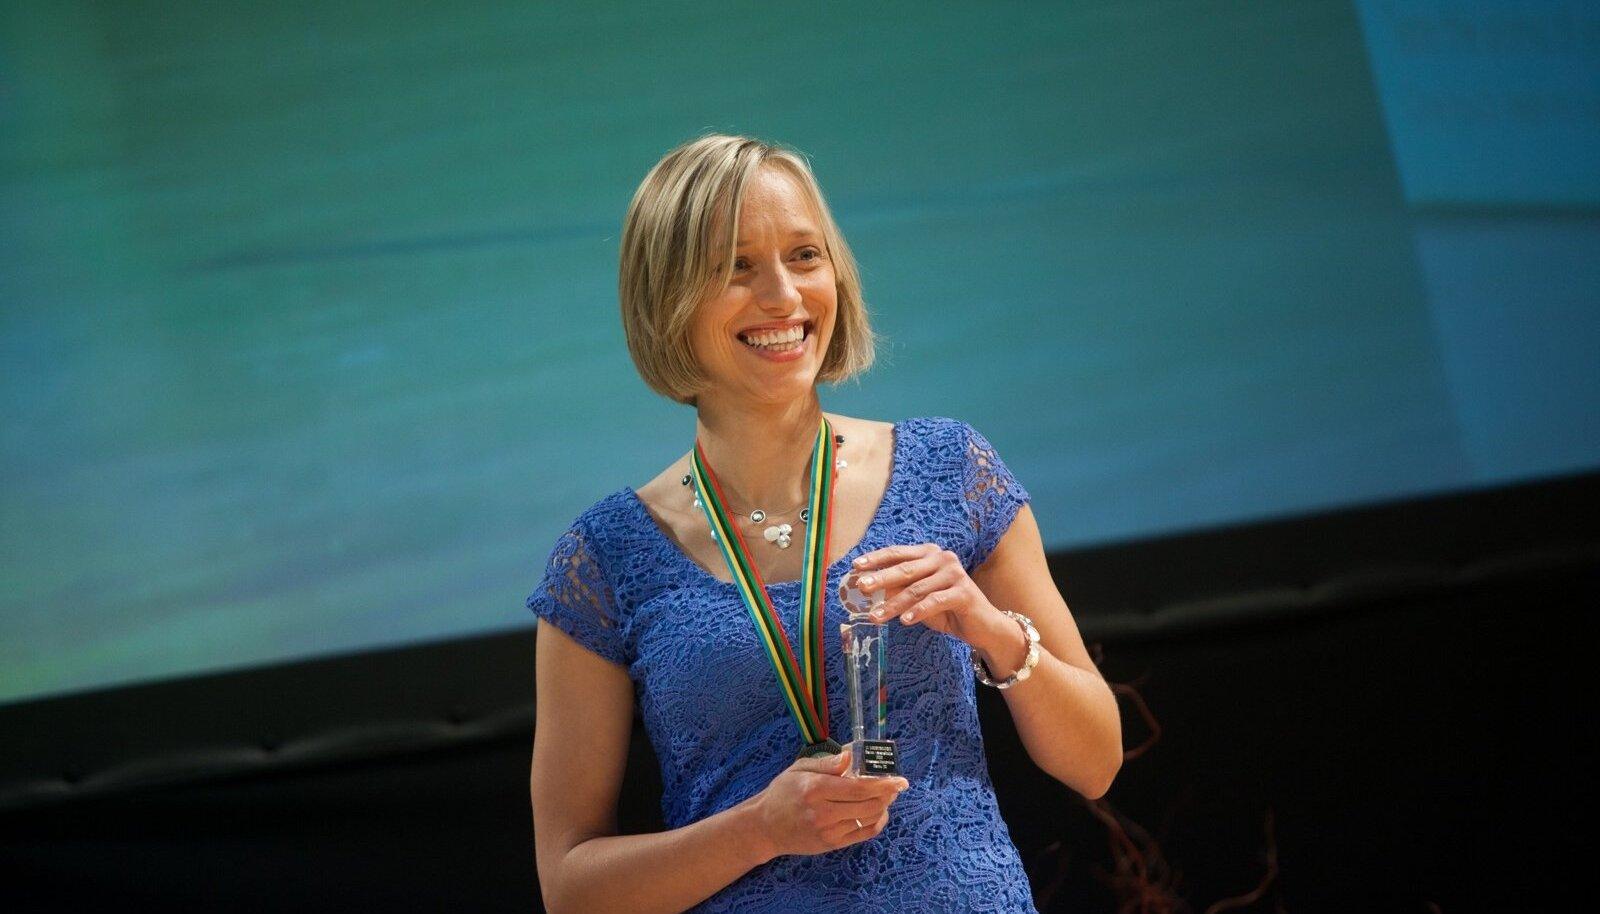 Anastassia Morkovkina